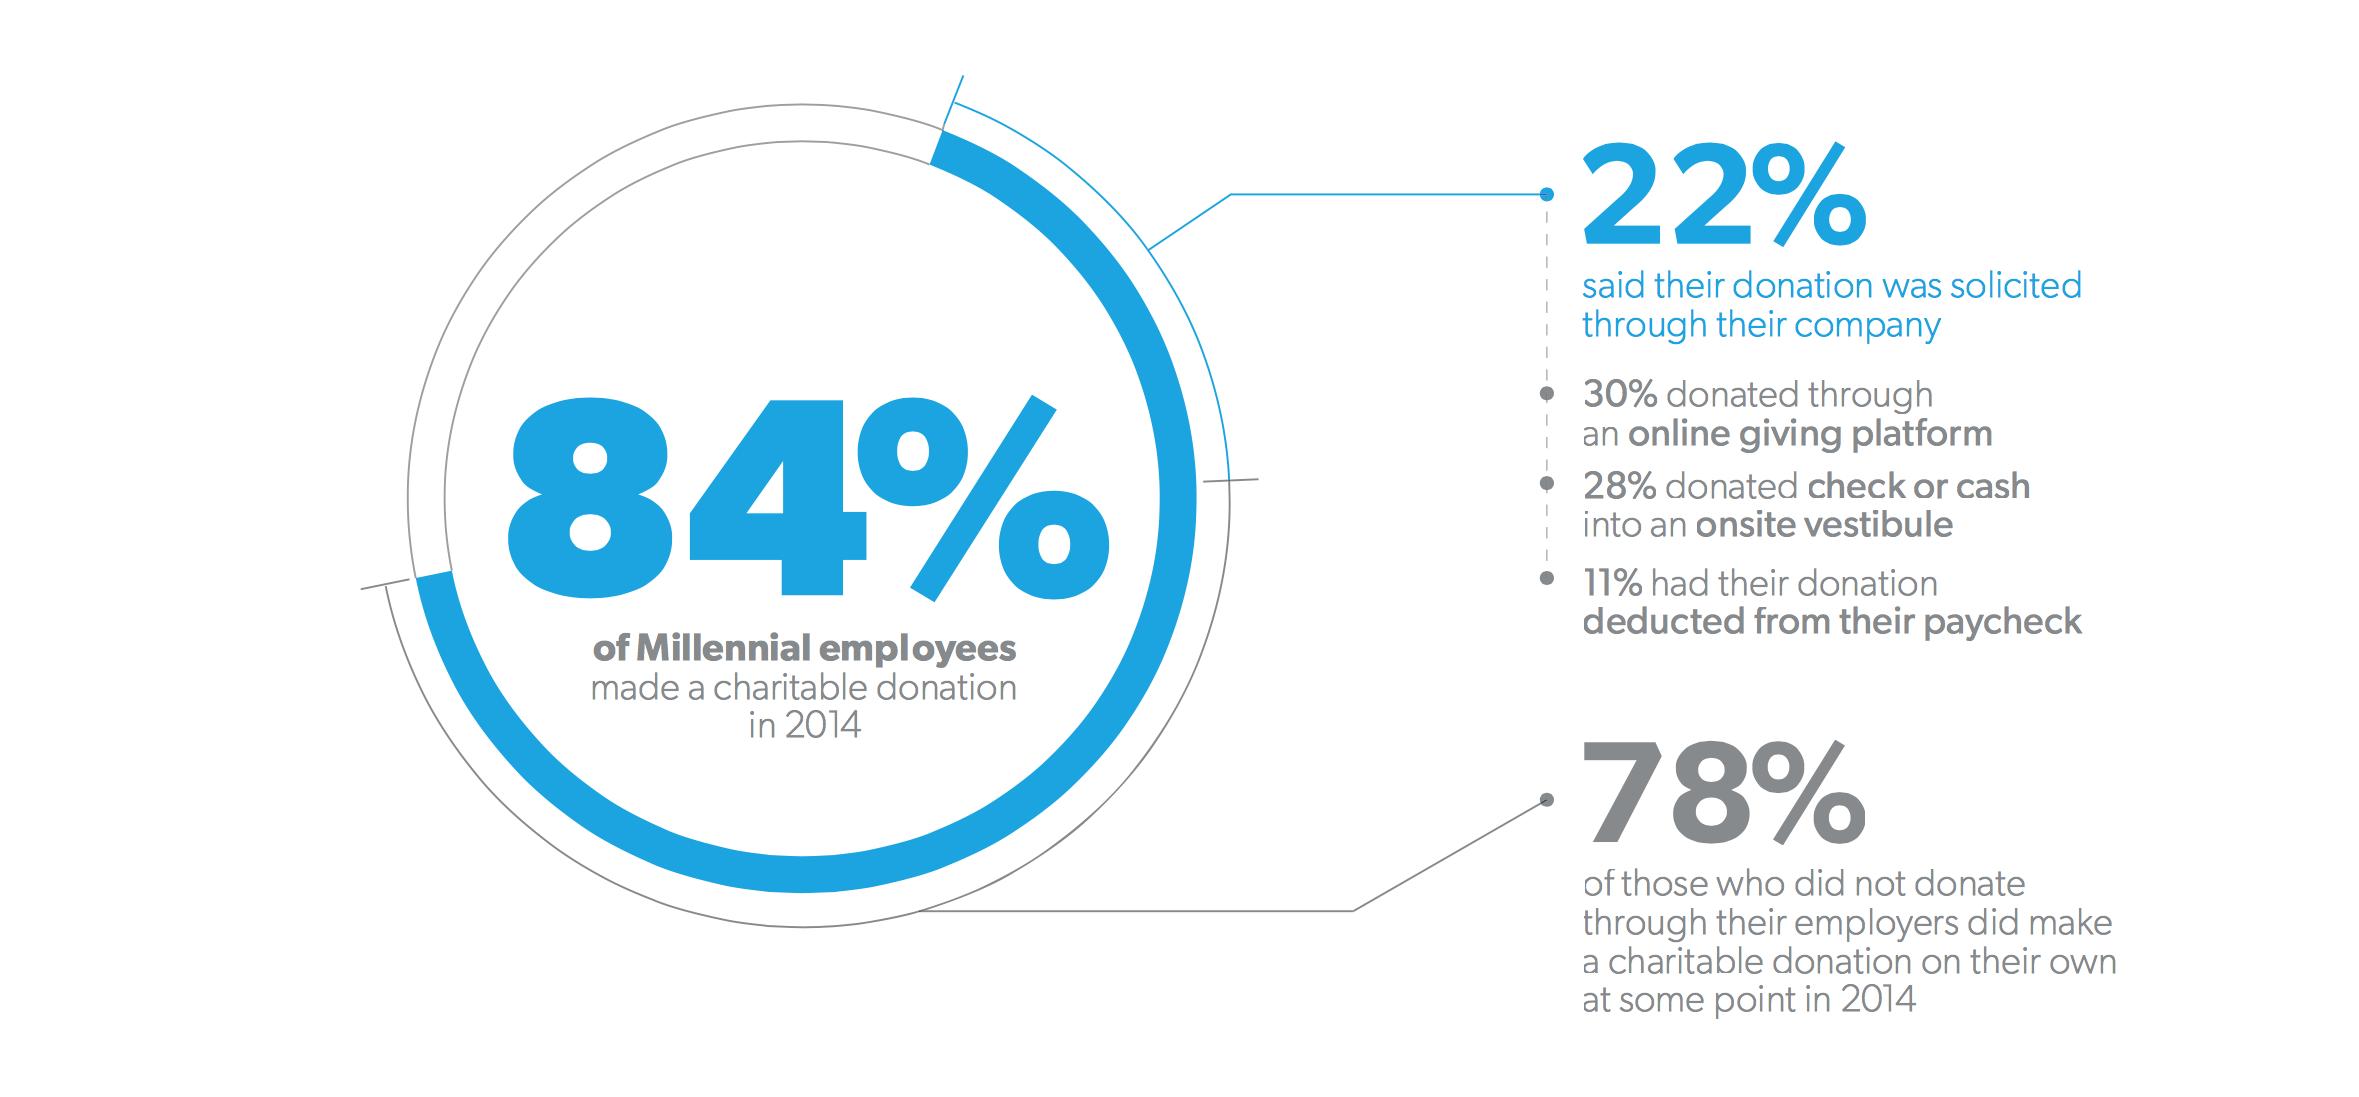 Source: 2015 Millennial Impact Report